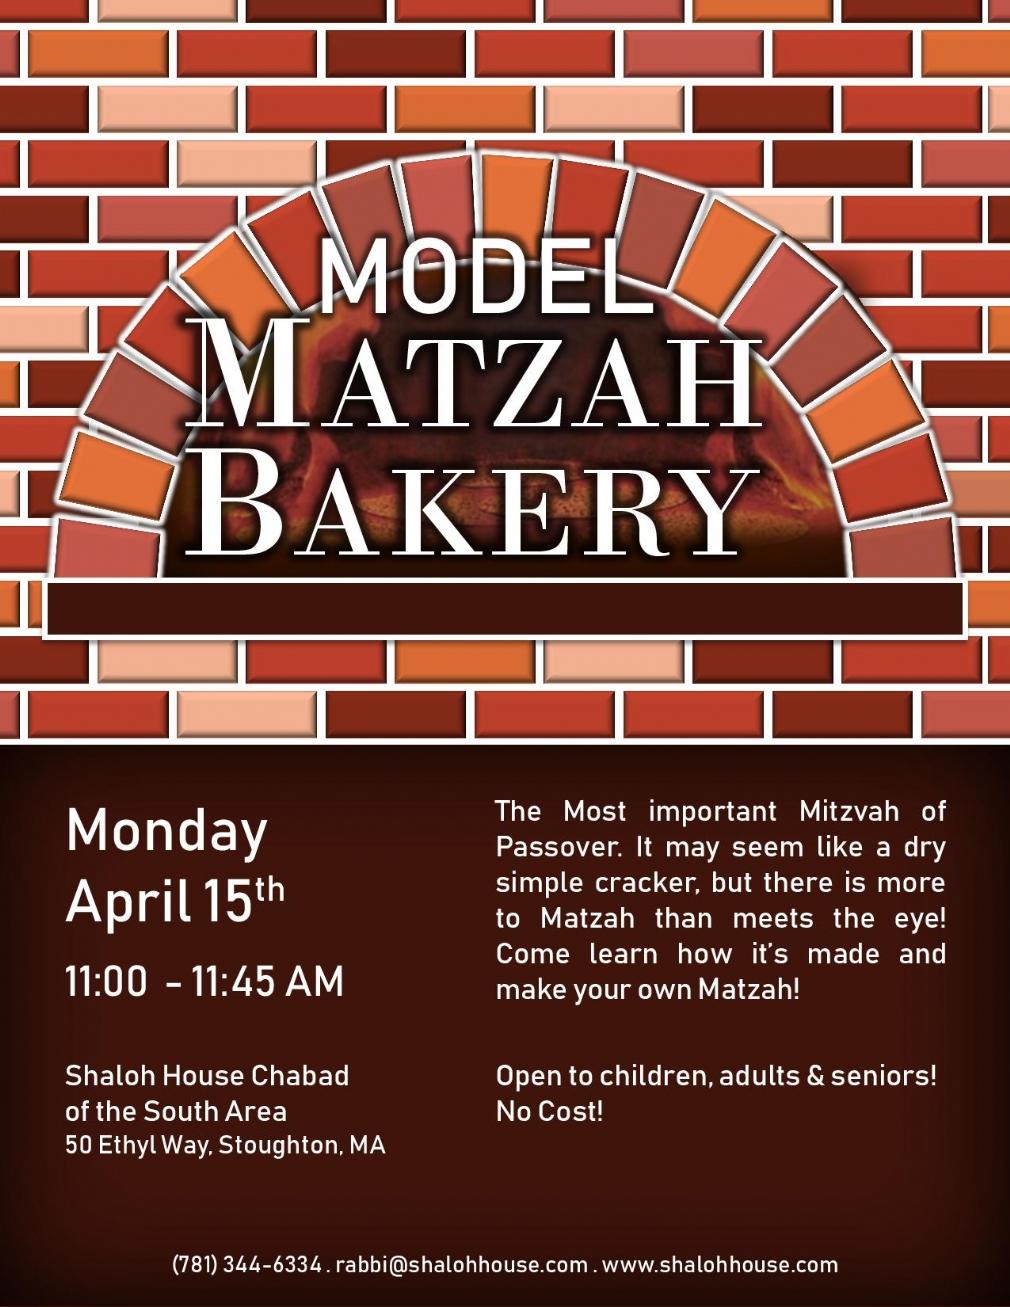 model matzah bakery flyer.png